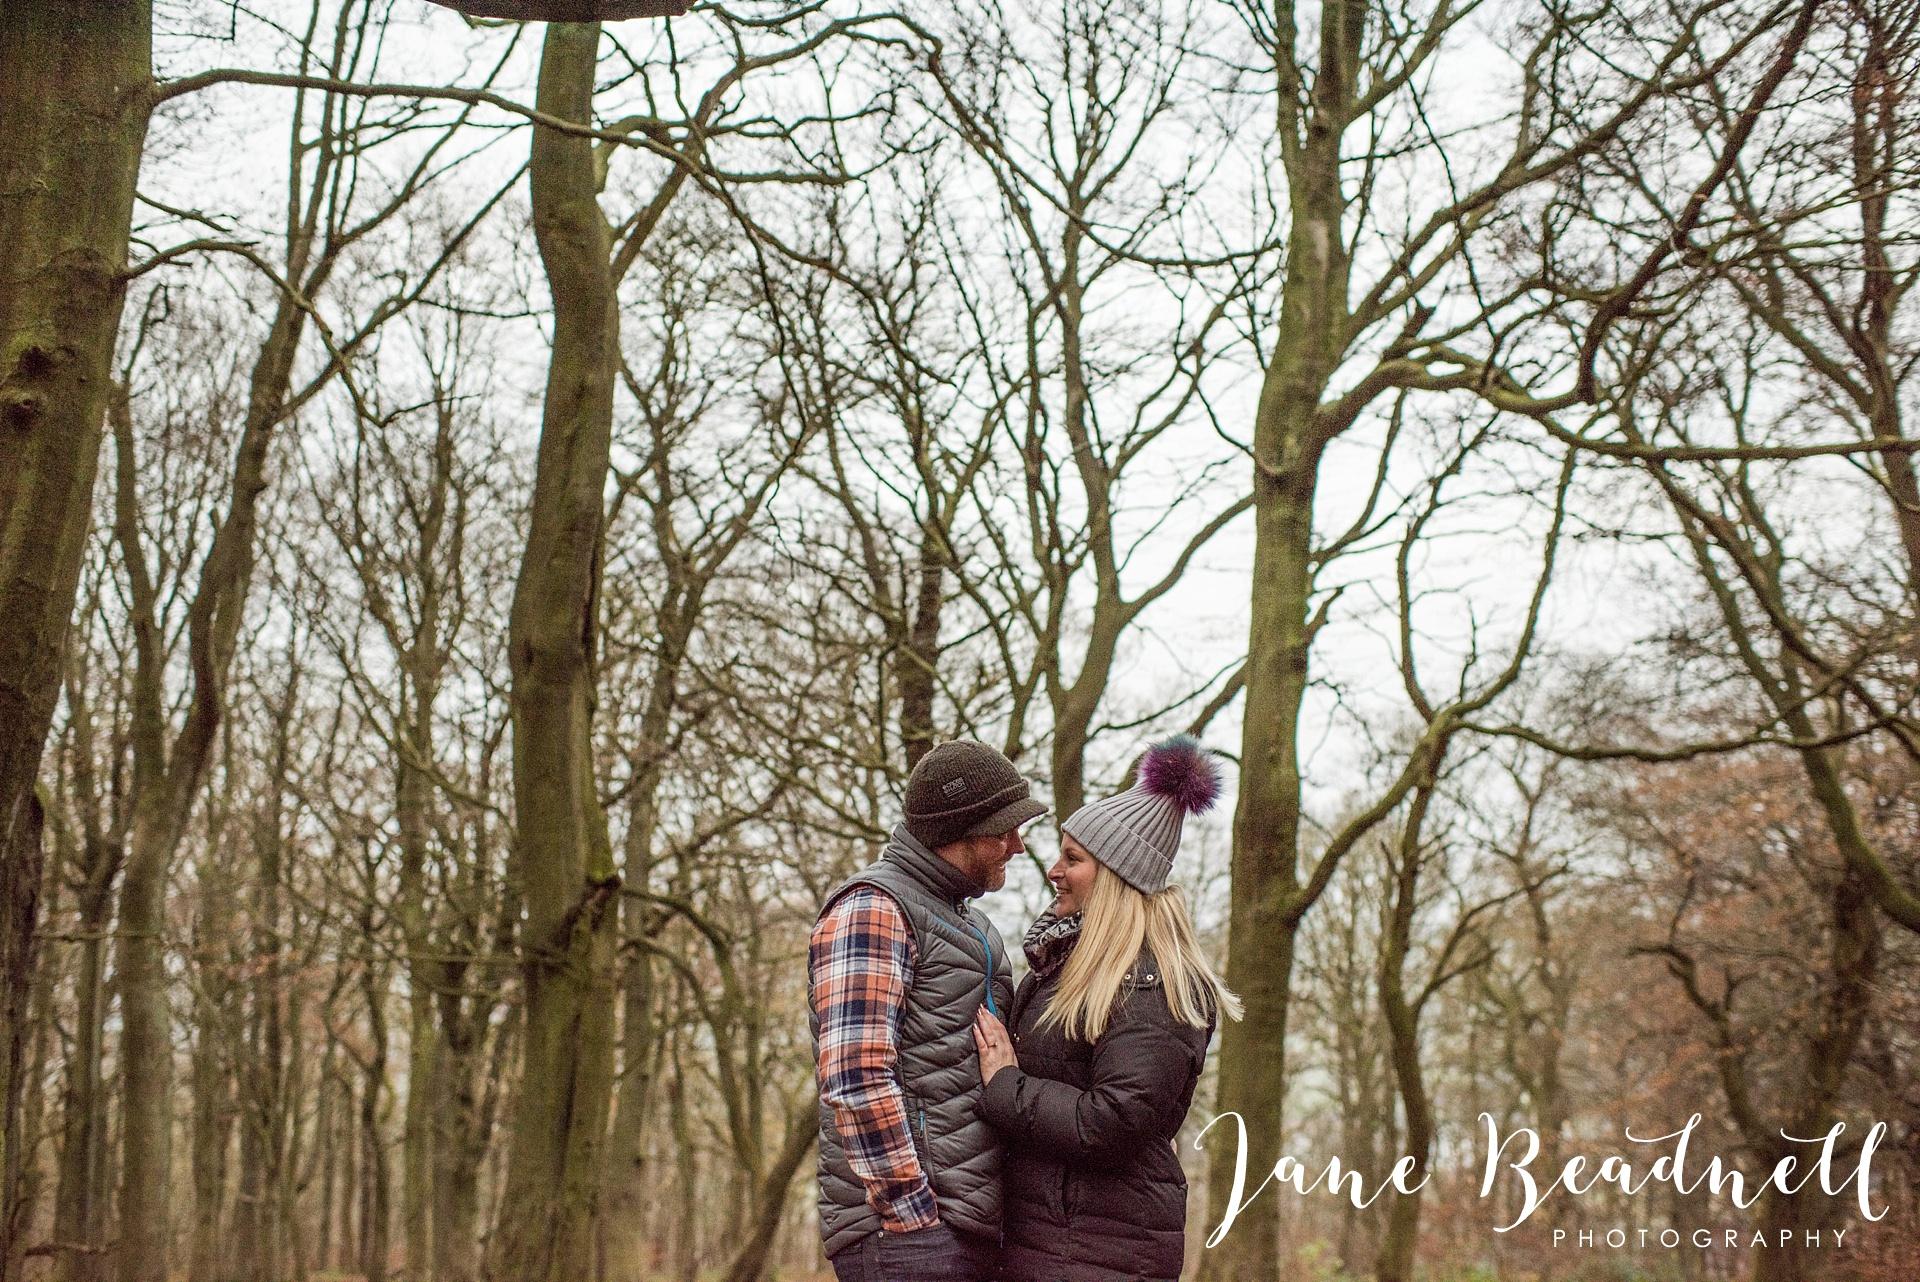 yorkshire-wedding-photographer-jane-beadnell-photography-uk-and-destination-wedding-photographer-engagement-shoot_0040